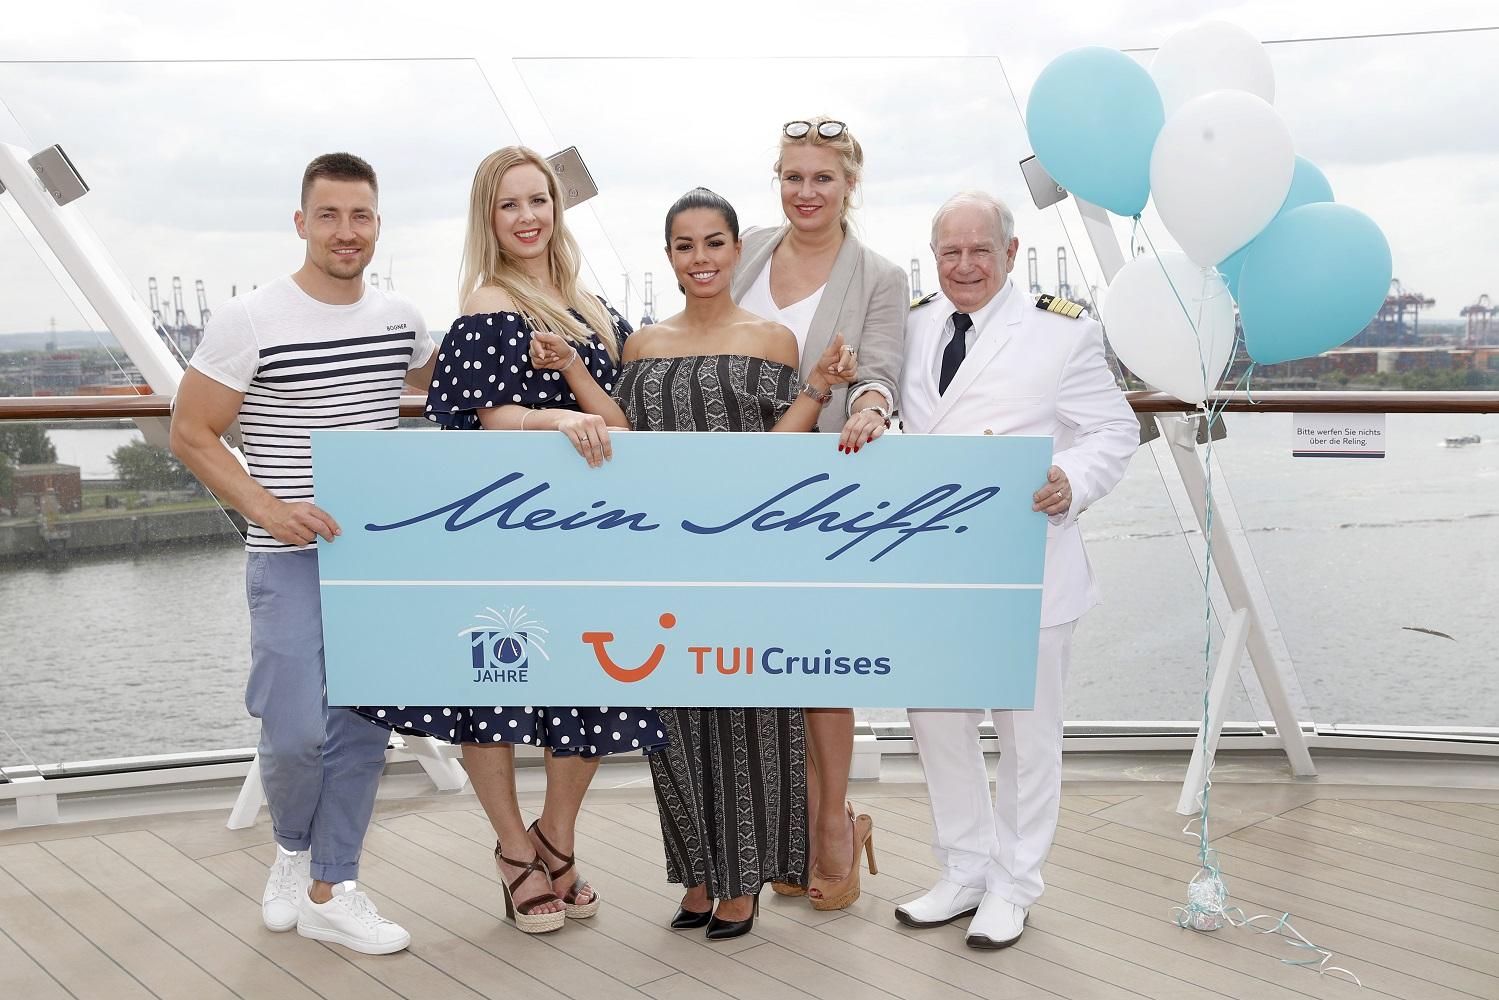 Bei der Taufe der neuen Mein Schiff 1 dabei: Philipp Boy, Isabel Edvardson, Fernanda Brandao, Magdalena Brzeska and Kjell Holm (Photo by Franziska Krug/Getty Images for TUI Cruises)